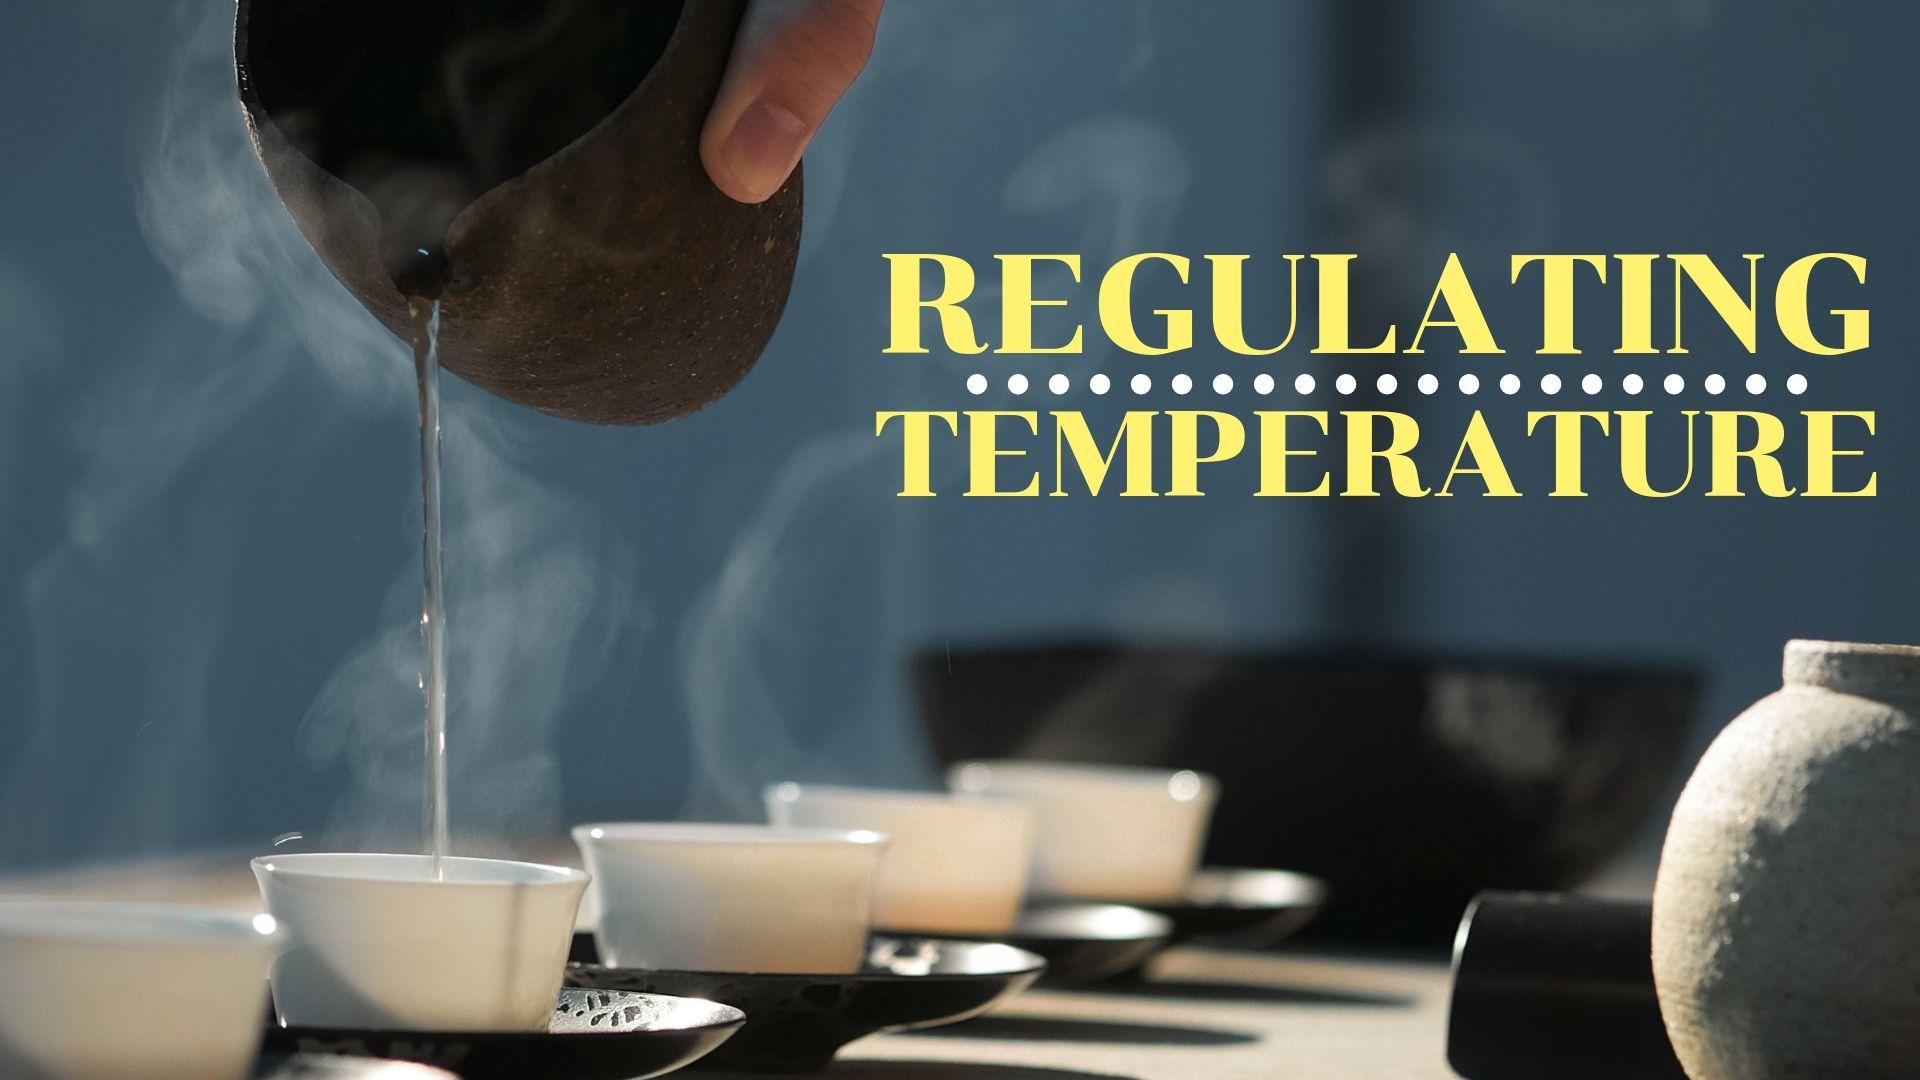 Regulating Temperature.jpg